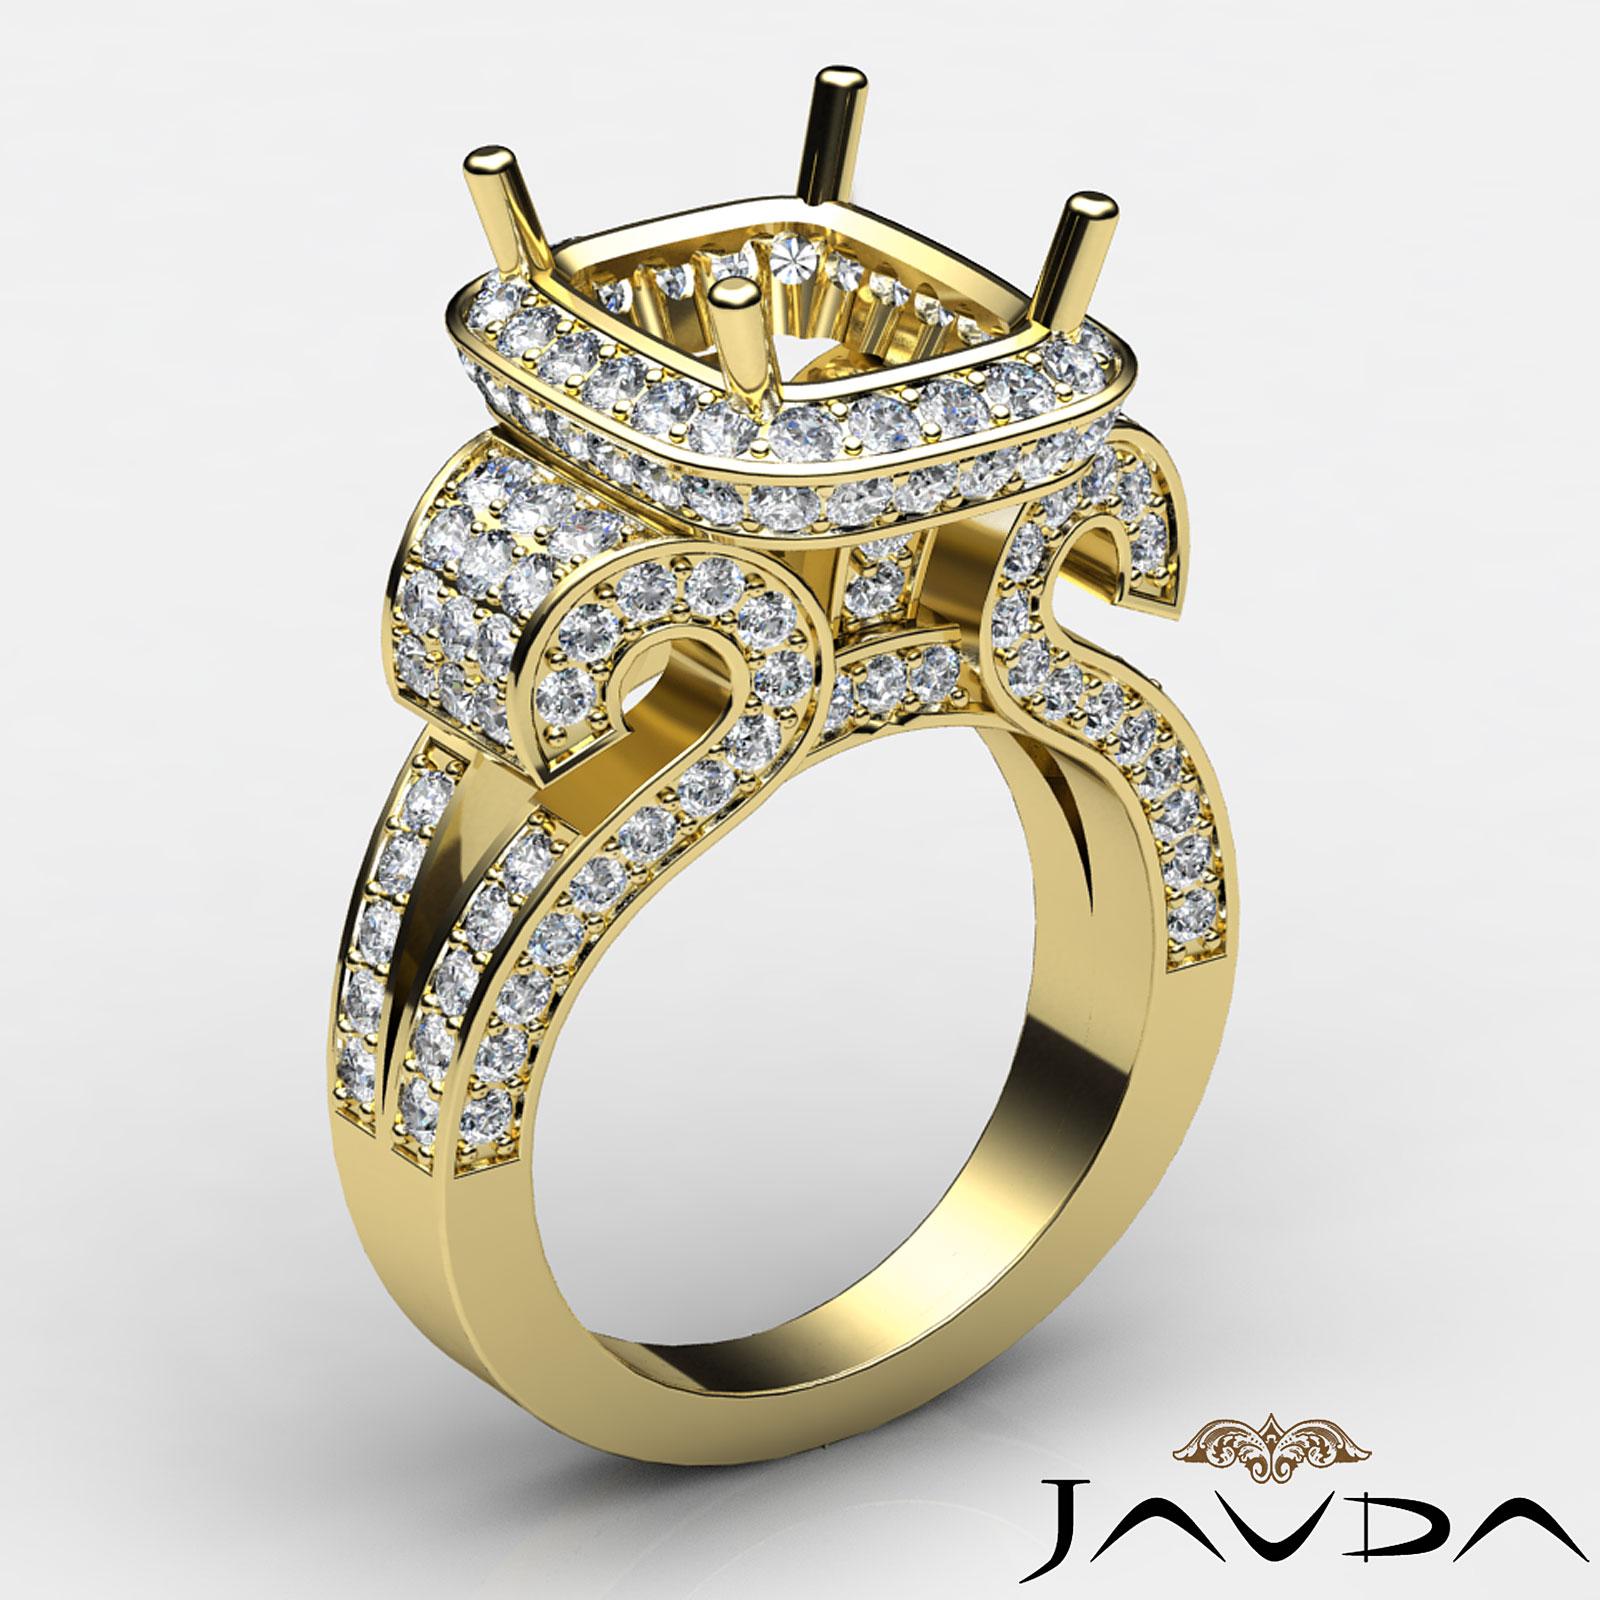 radiant diamond fine antique anniversary semi mount ring. Black Bedroom Furniture Sets. Home Design Ideas